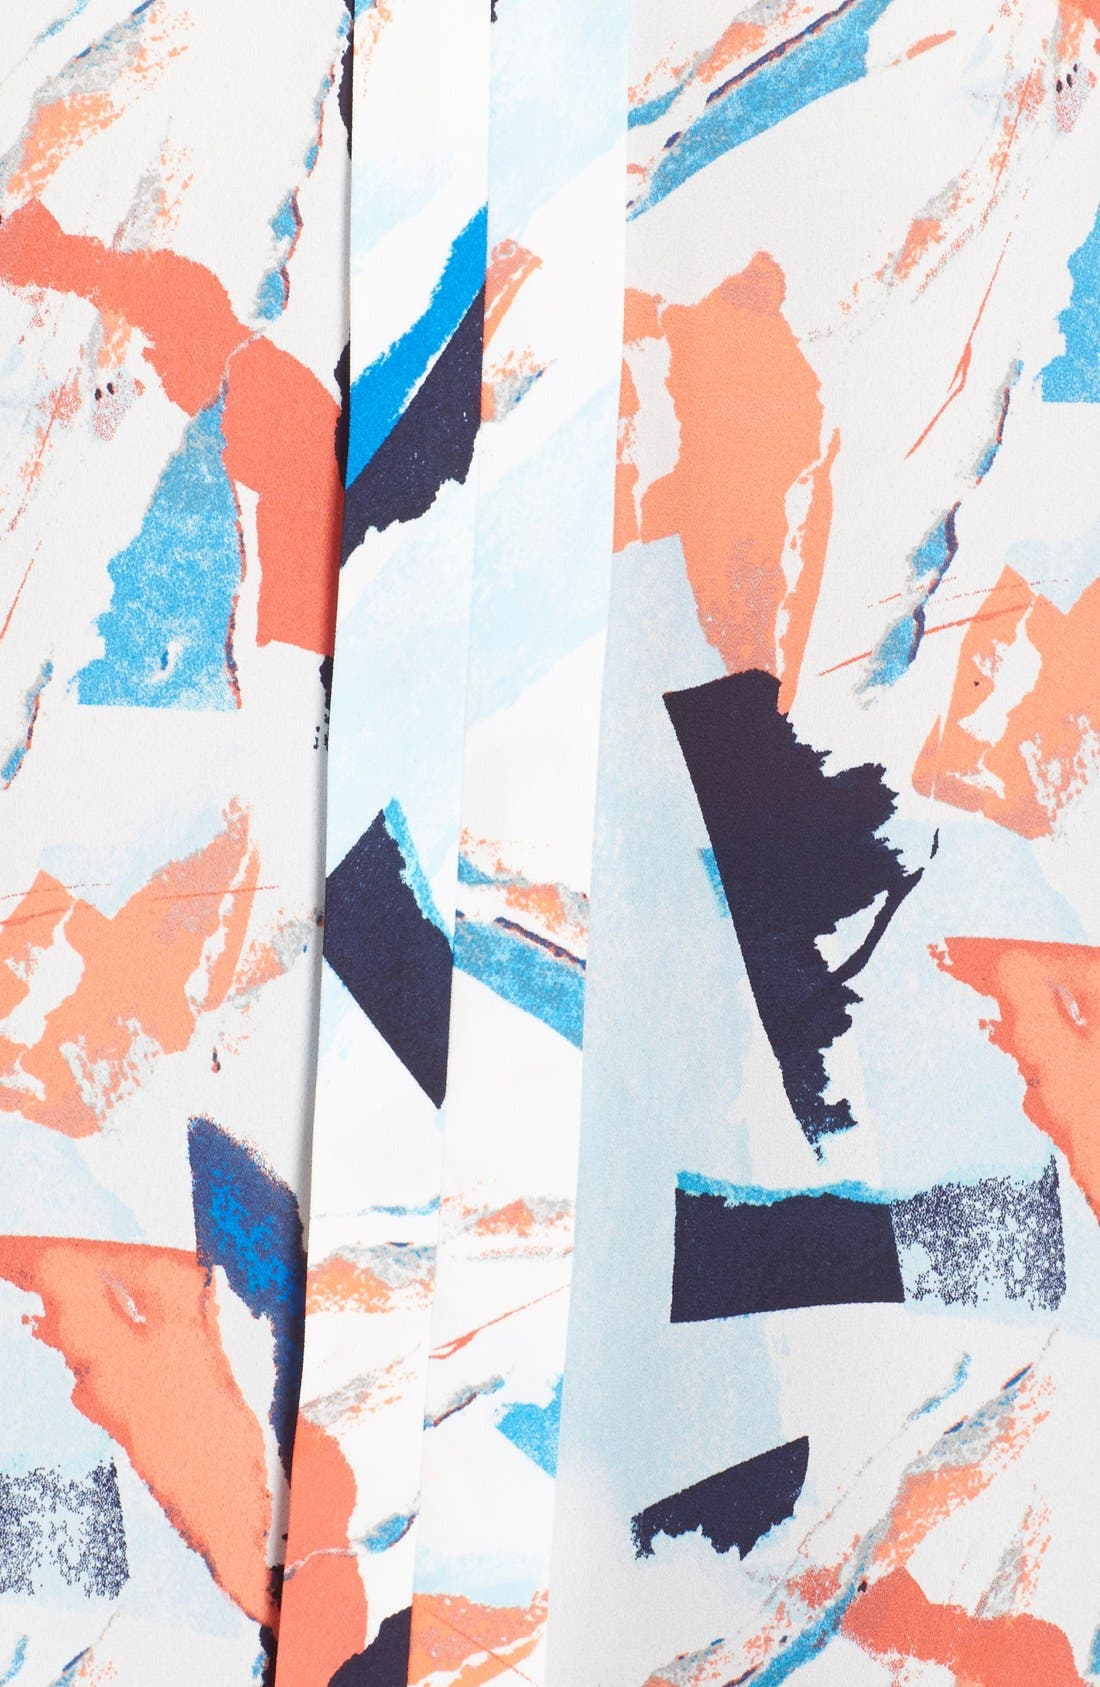 Sheer Sleeve Split Neck Blouse,                             Alternate thumbnail 5, color,                             Blue Abstract Ship Print